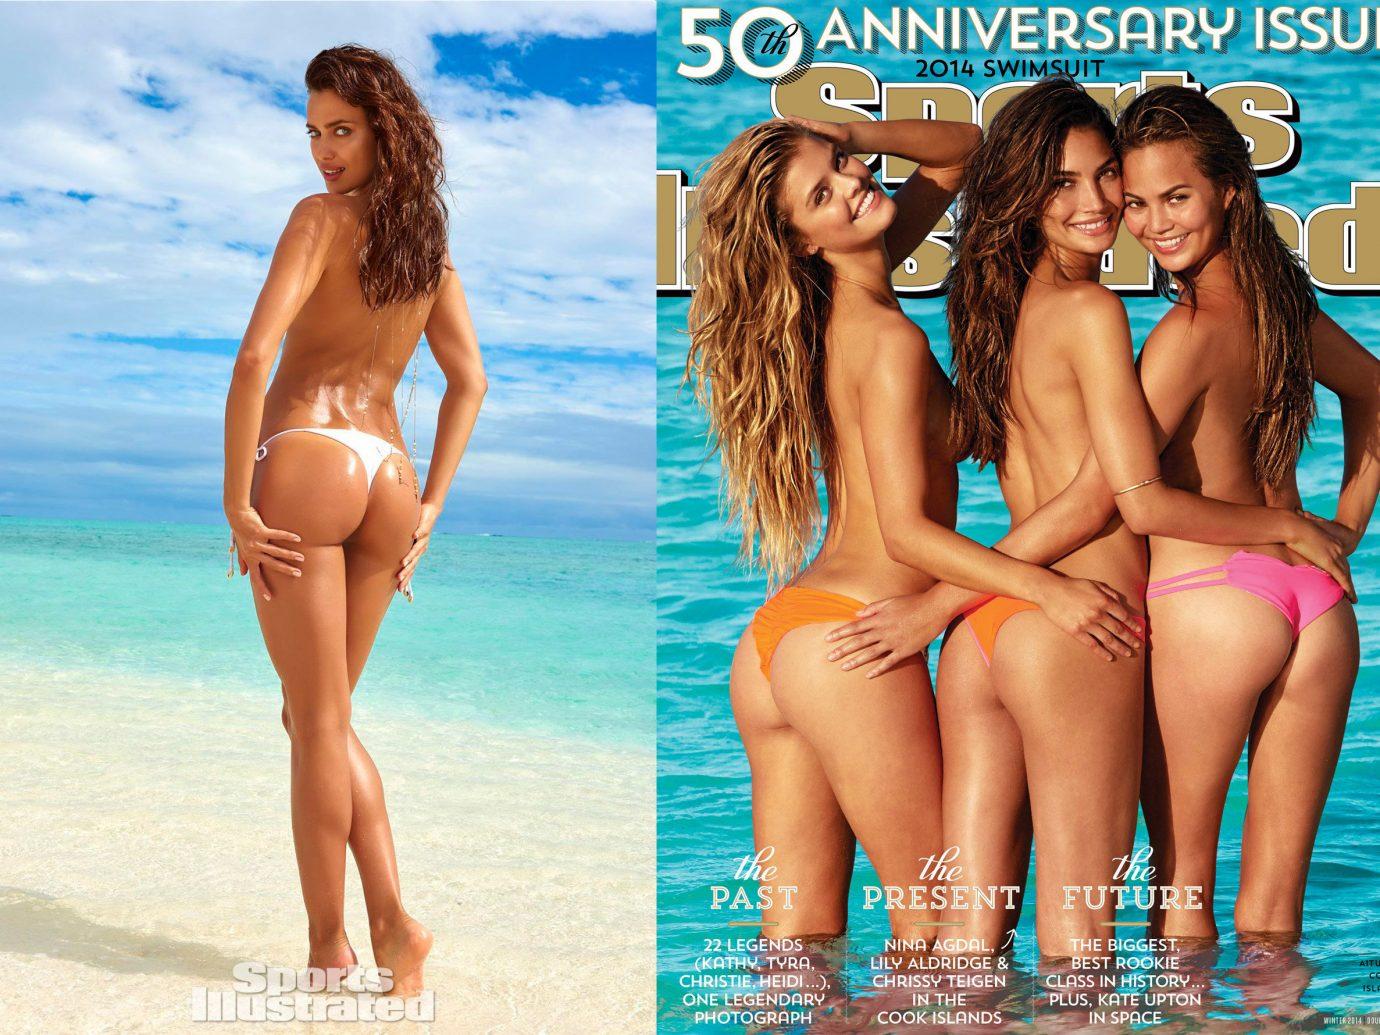 Style + Design outdoor person swimsuit clothing swimwear supermodel vacation sun tanning leg model photo shoot spring break